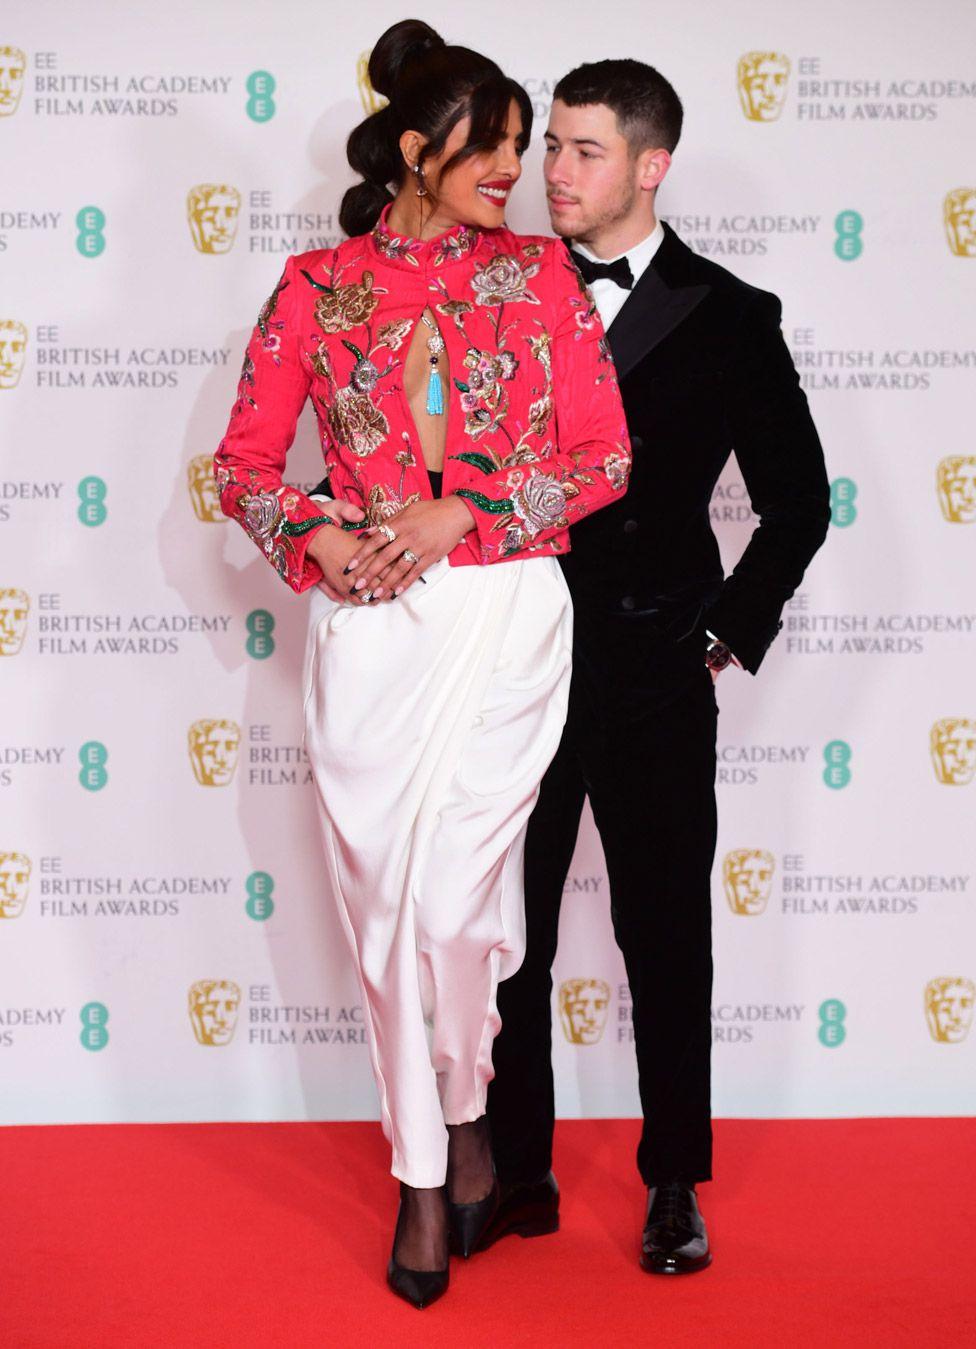 Priyanka Chopra Jones and husband Nick Jonas